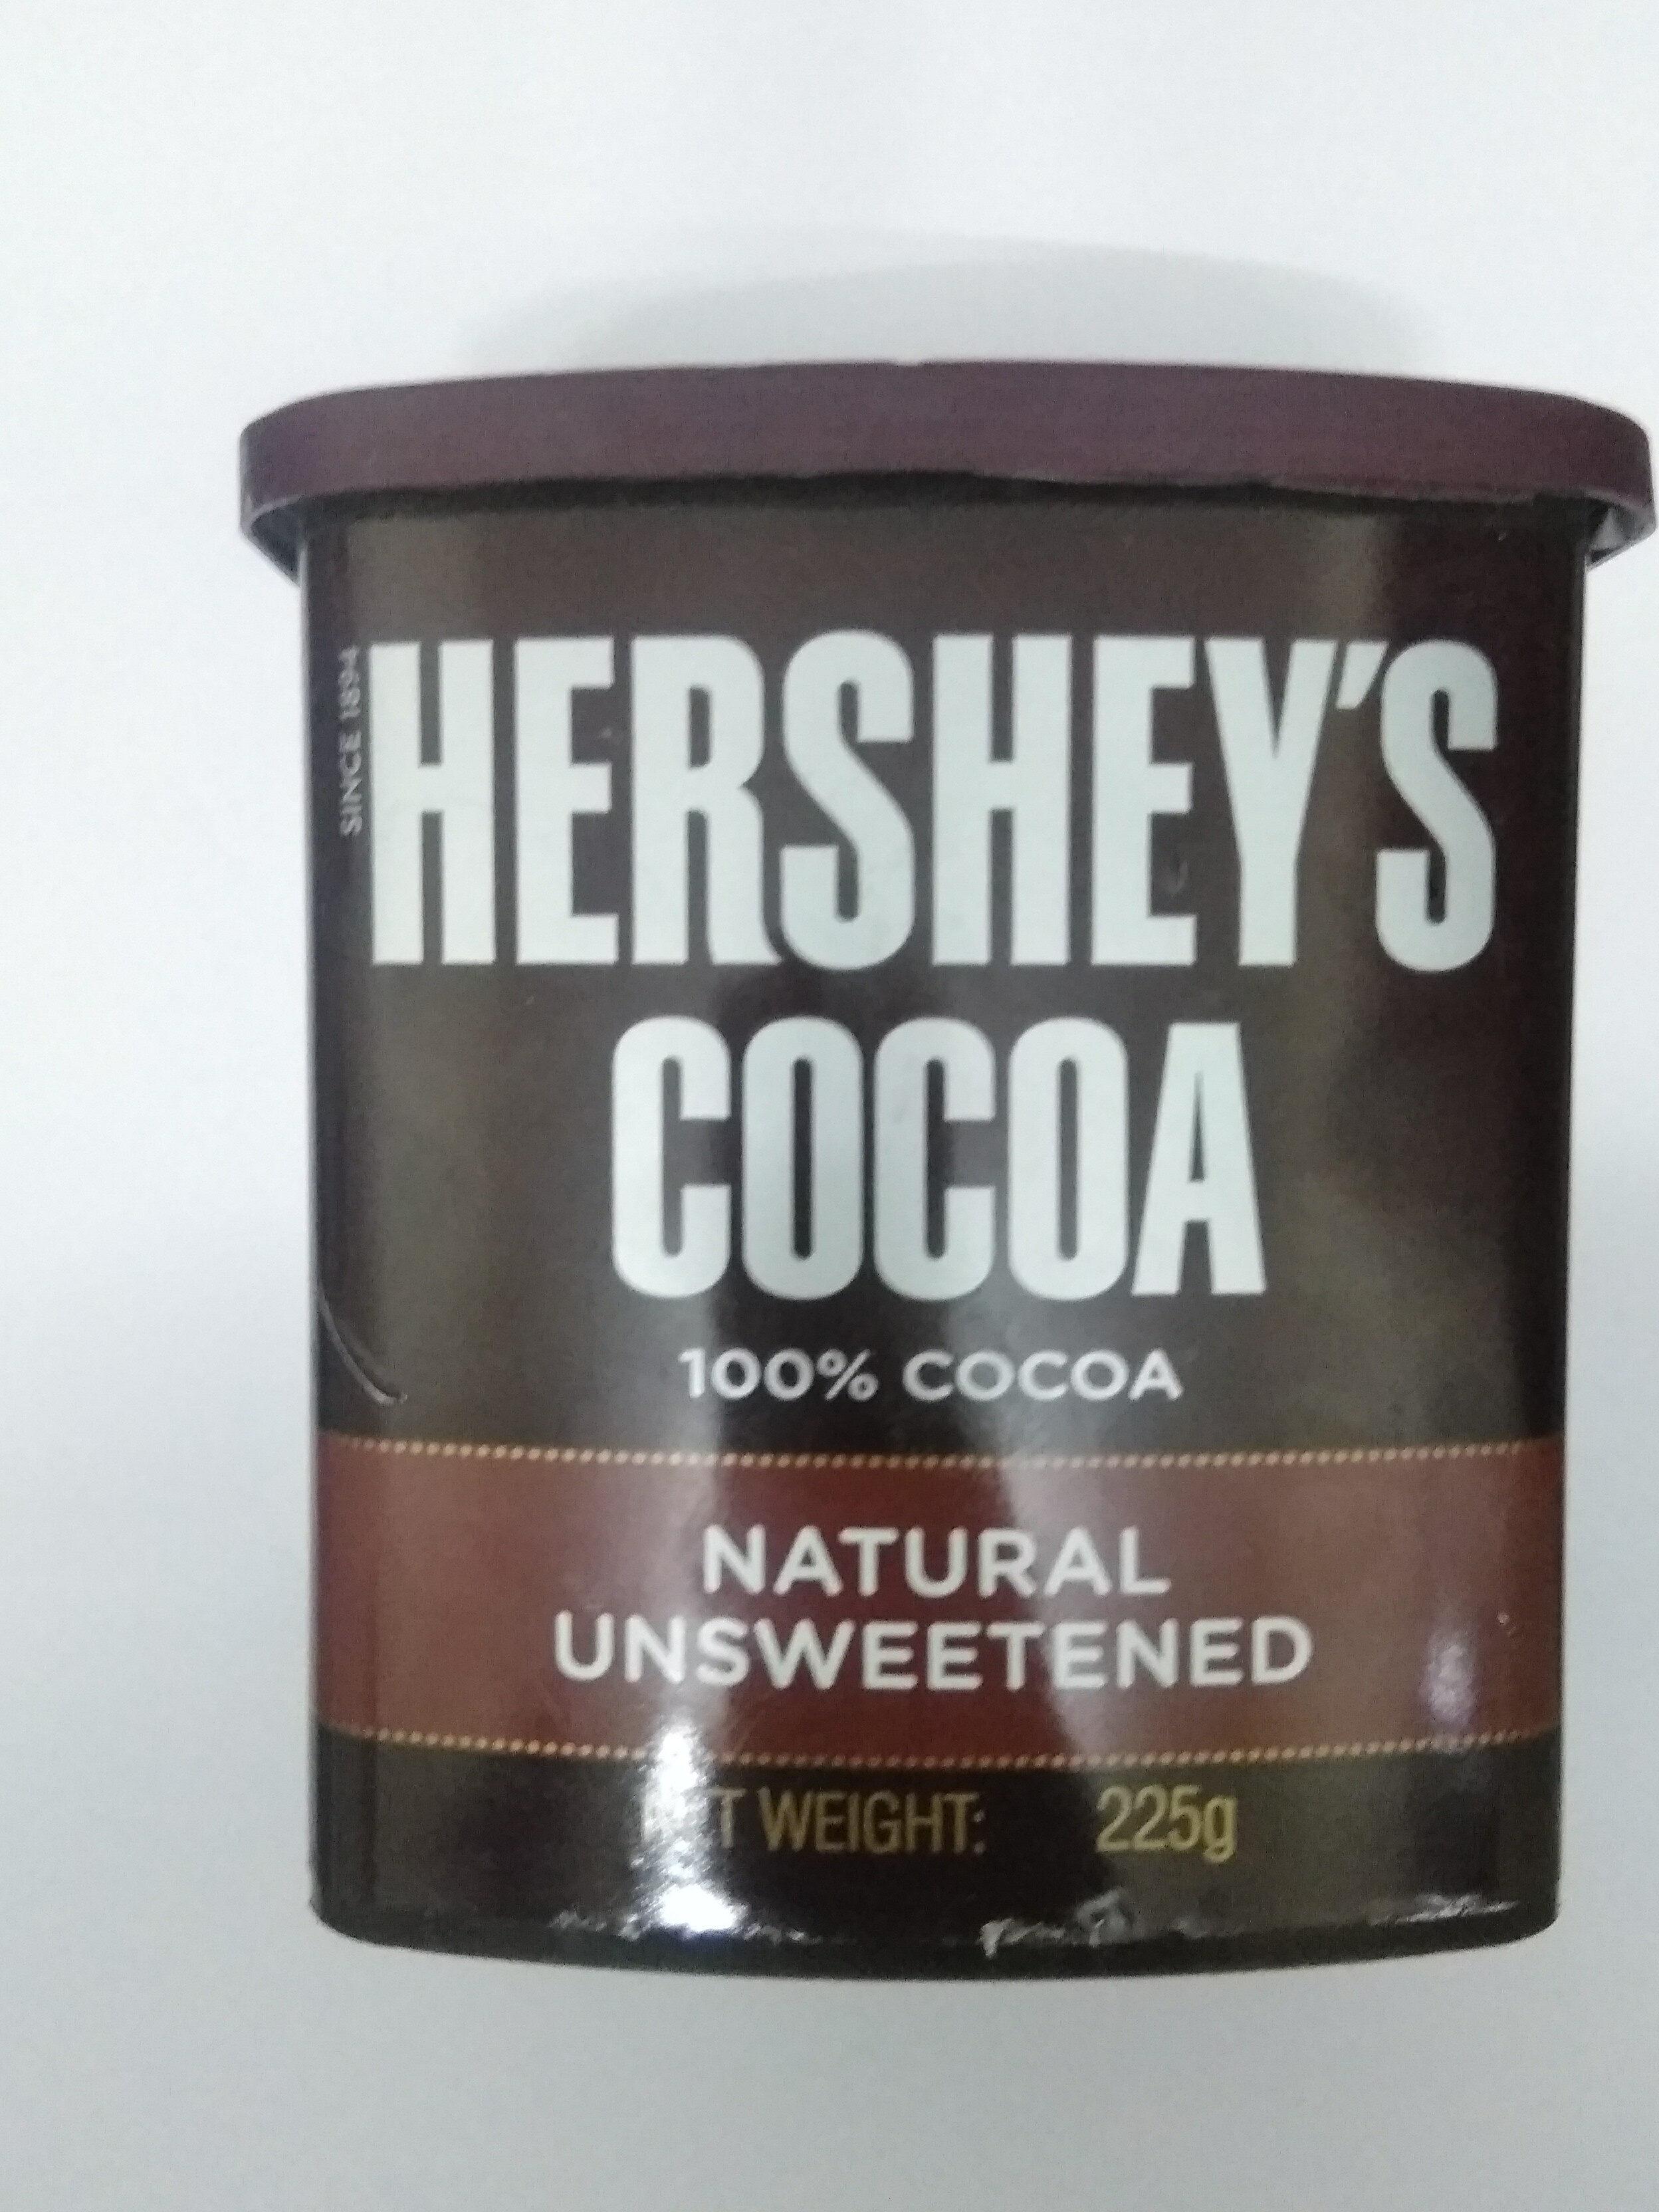 Hershey's Cocoa powder - Product - en